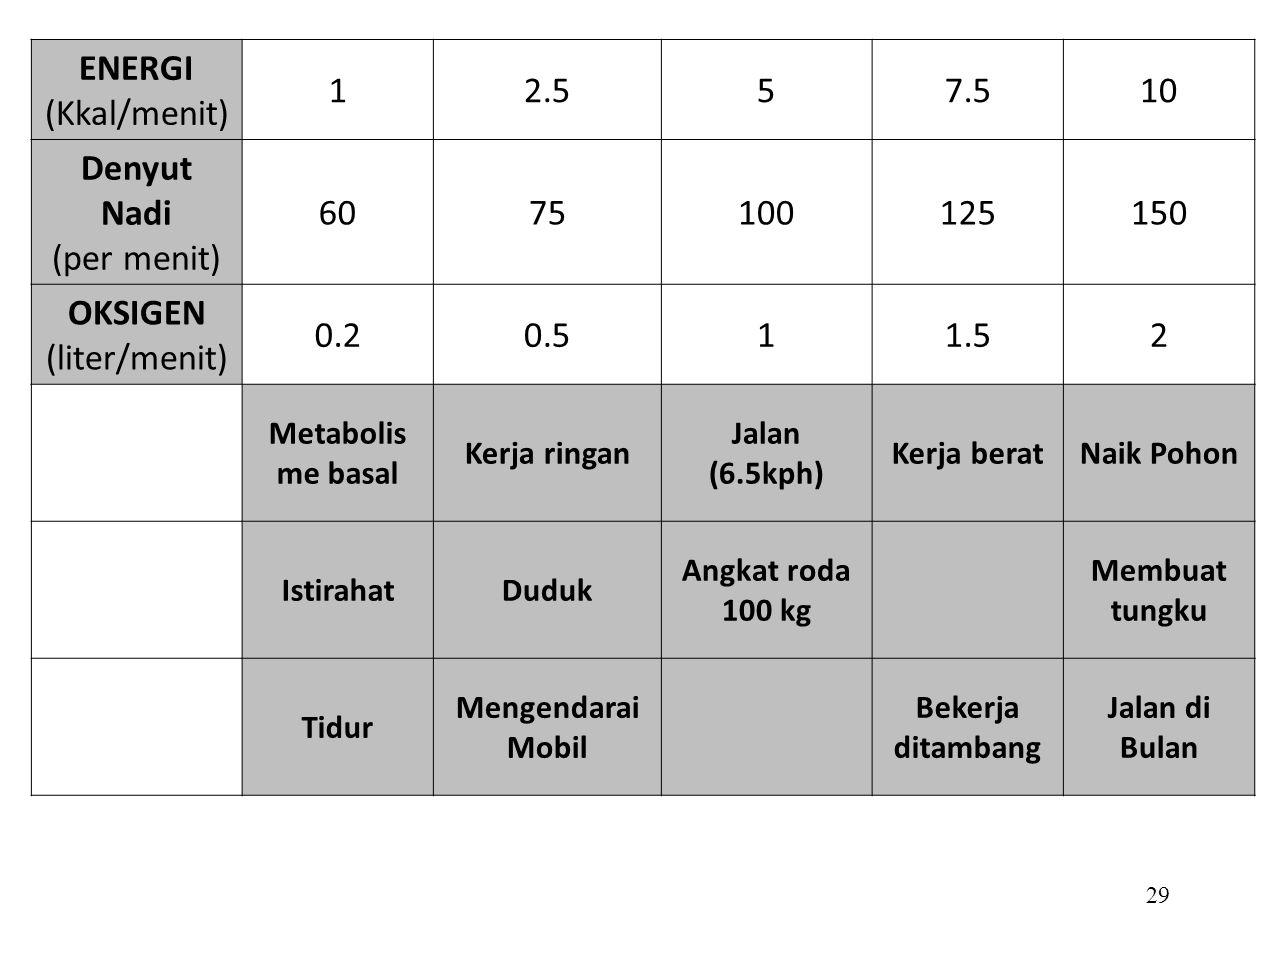 ENERGI (Kkal/menit) 1 2.5 5 7.5 10 Denyut Nadi (per menit) 60 75 100